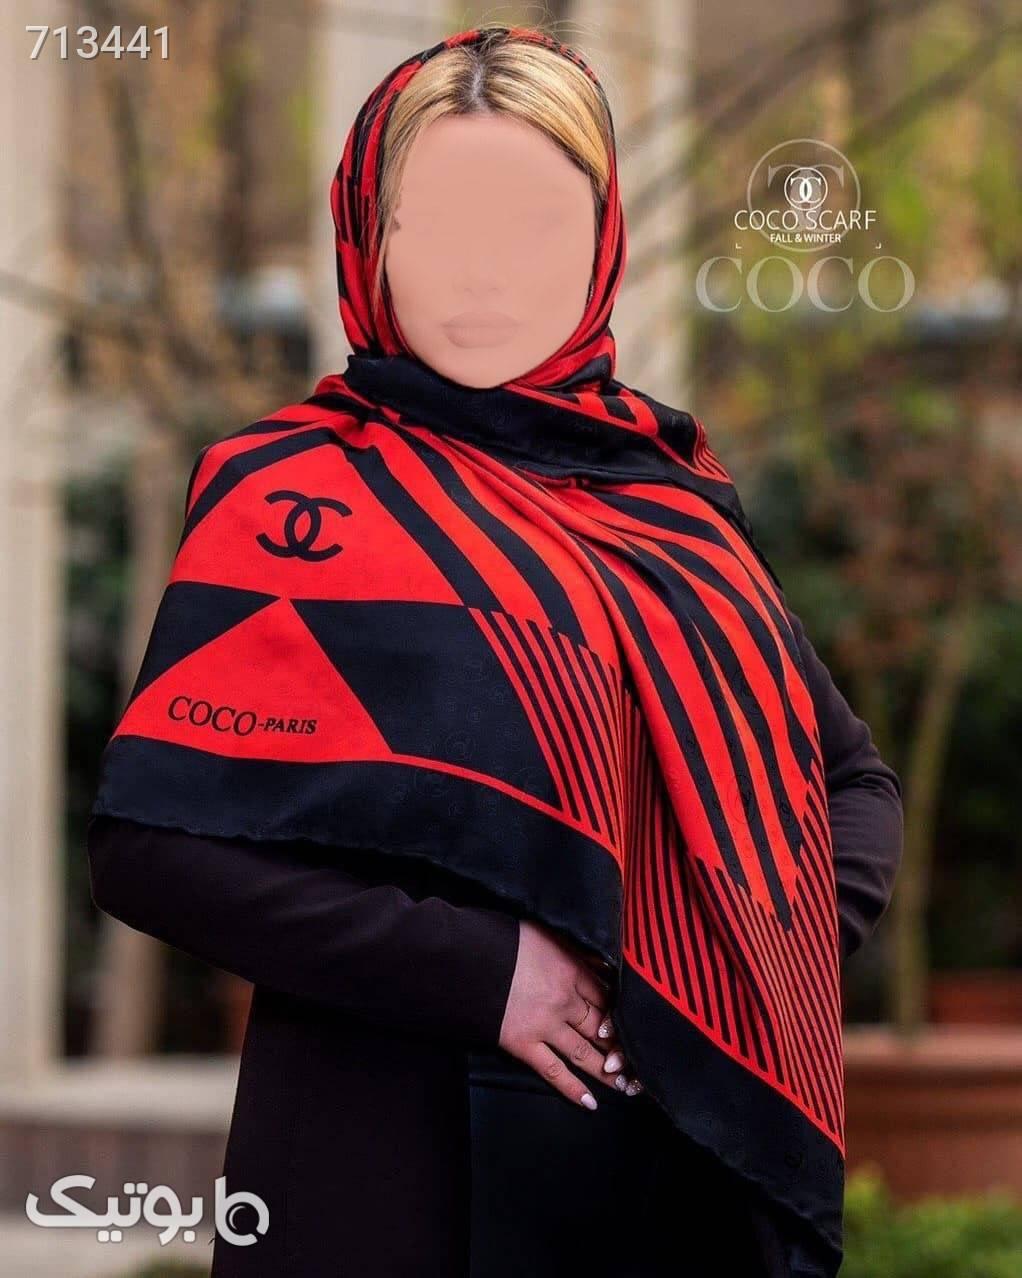 روسری ابریشم ژاکارد قرمز مشکی مشکی شال و روسری